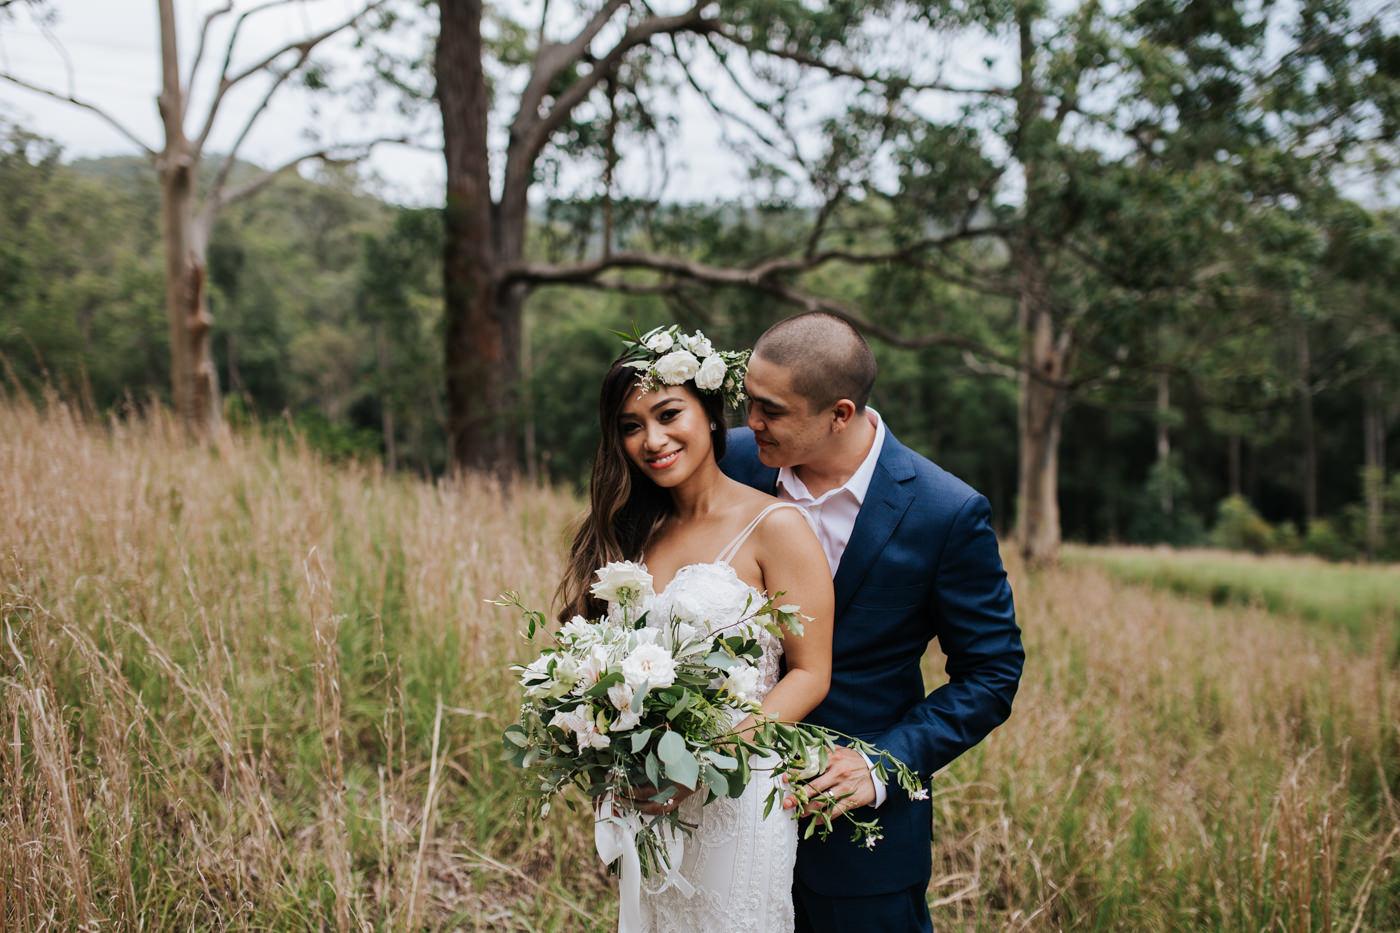 Nick & Vanezza - Fernbank Farm Wedding - Samantha Heather Photography-108.jpg